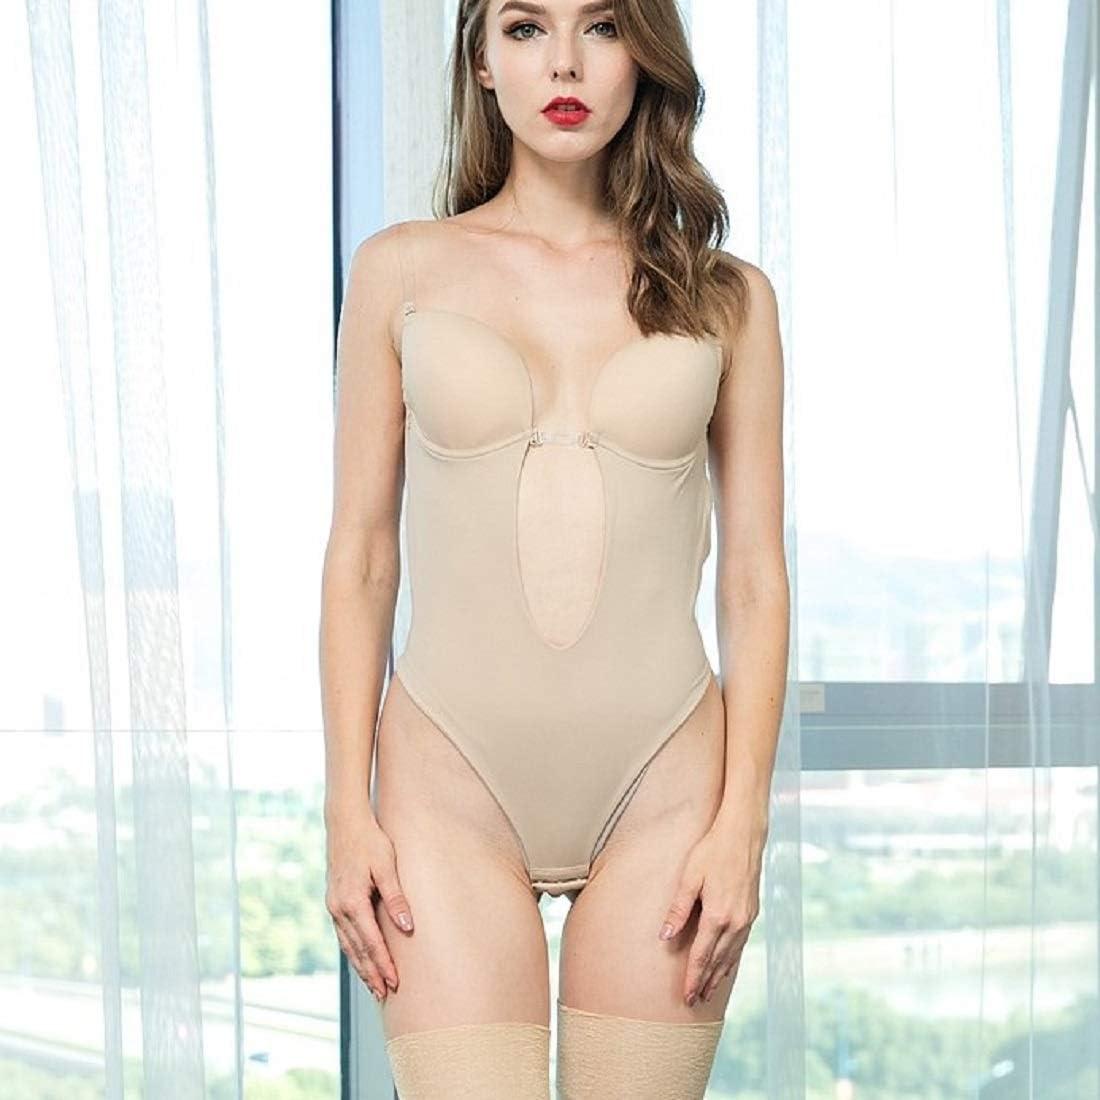 Womens Plunging V-Neck Clear Straps Bodysuit Backless Bridal Underwear Body Shaper Underwear for Party//Wedding